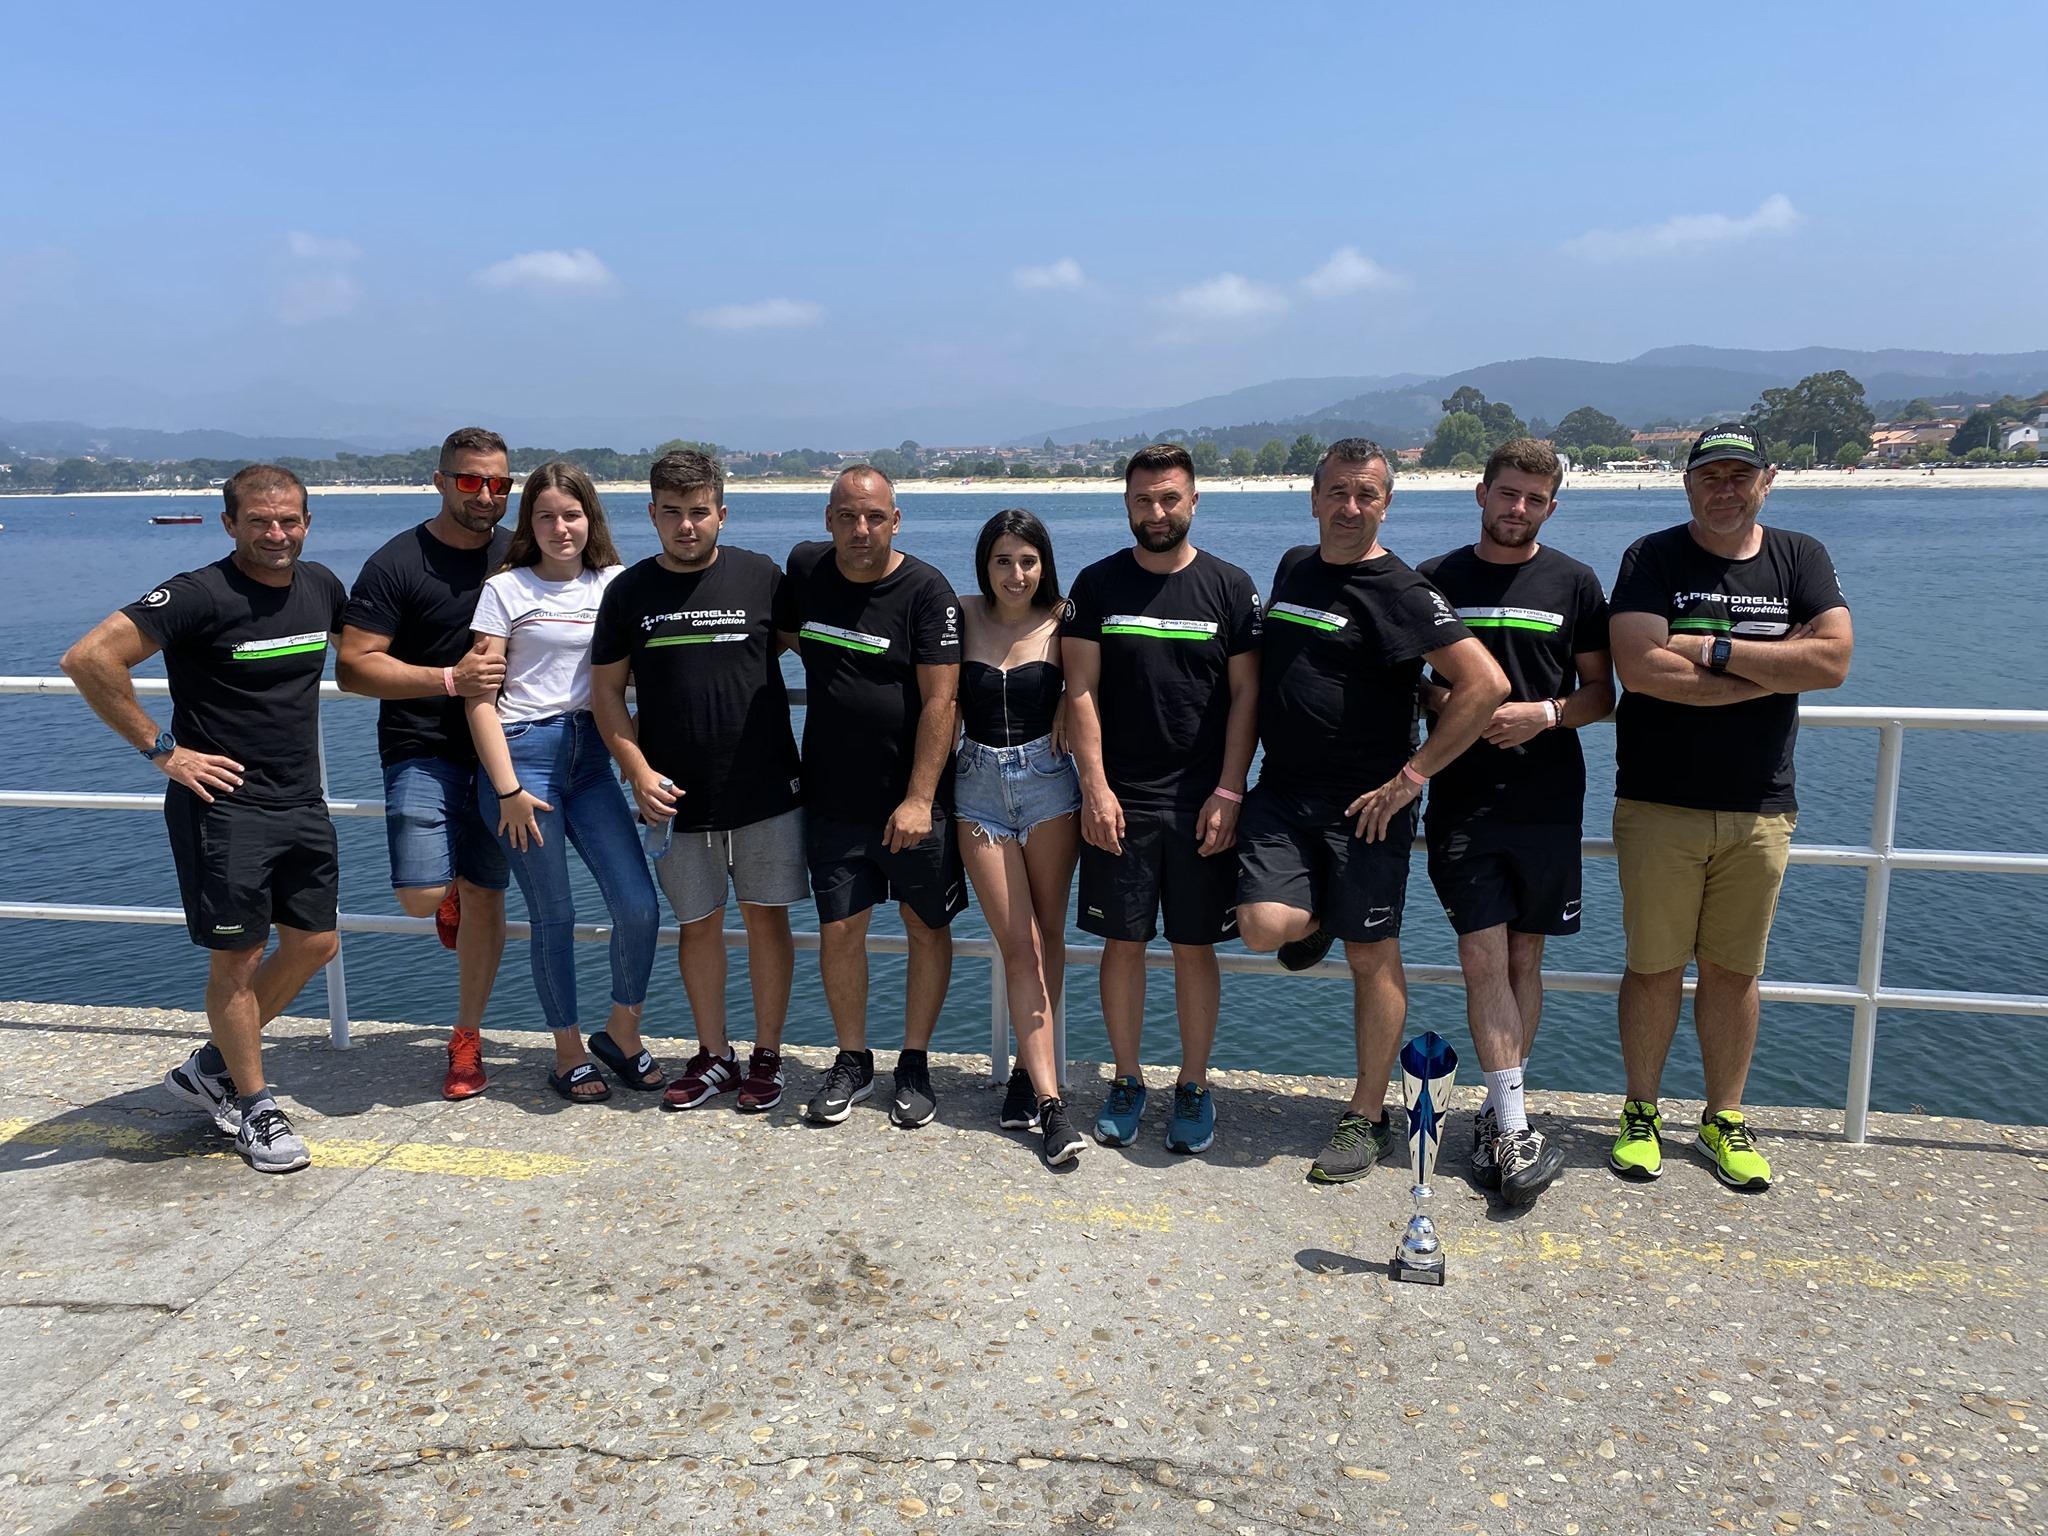 Team Pastorello